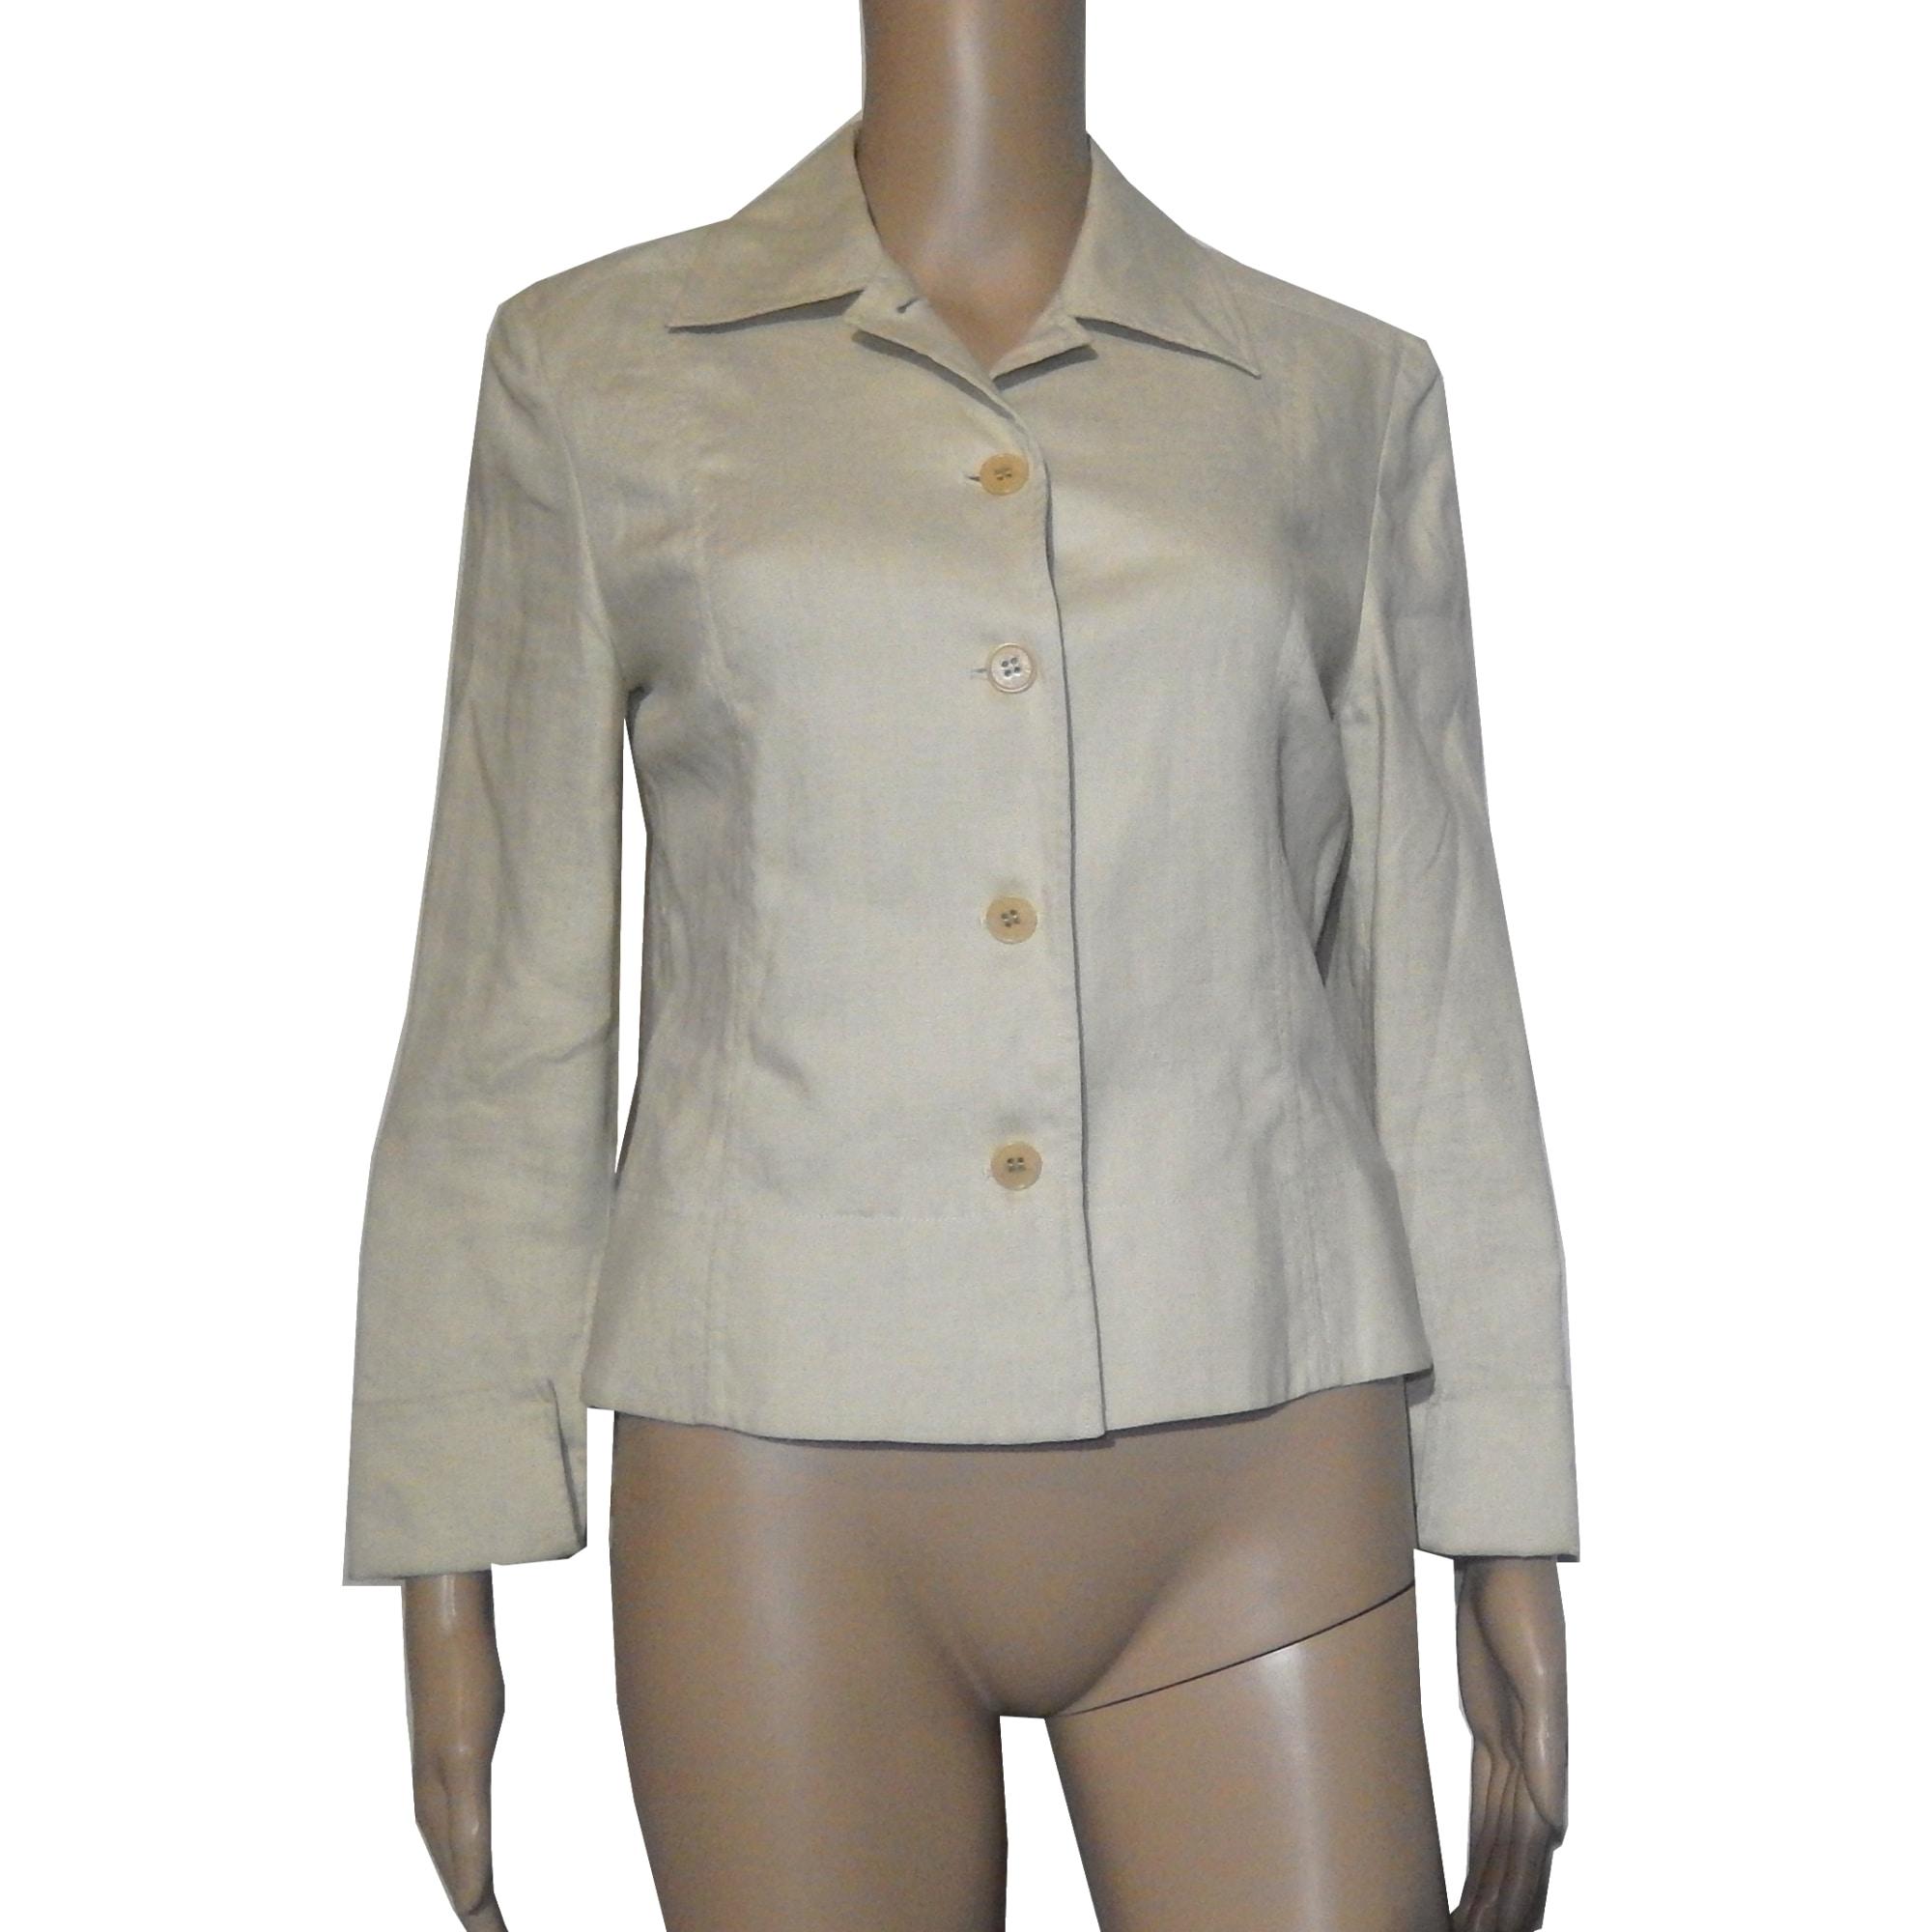 Blazer, veste tailleur ESPRIT Beige, camel